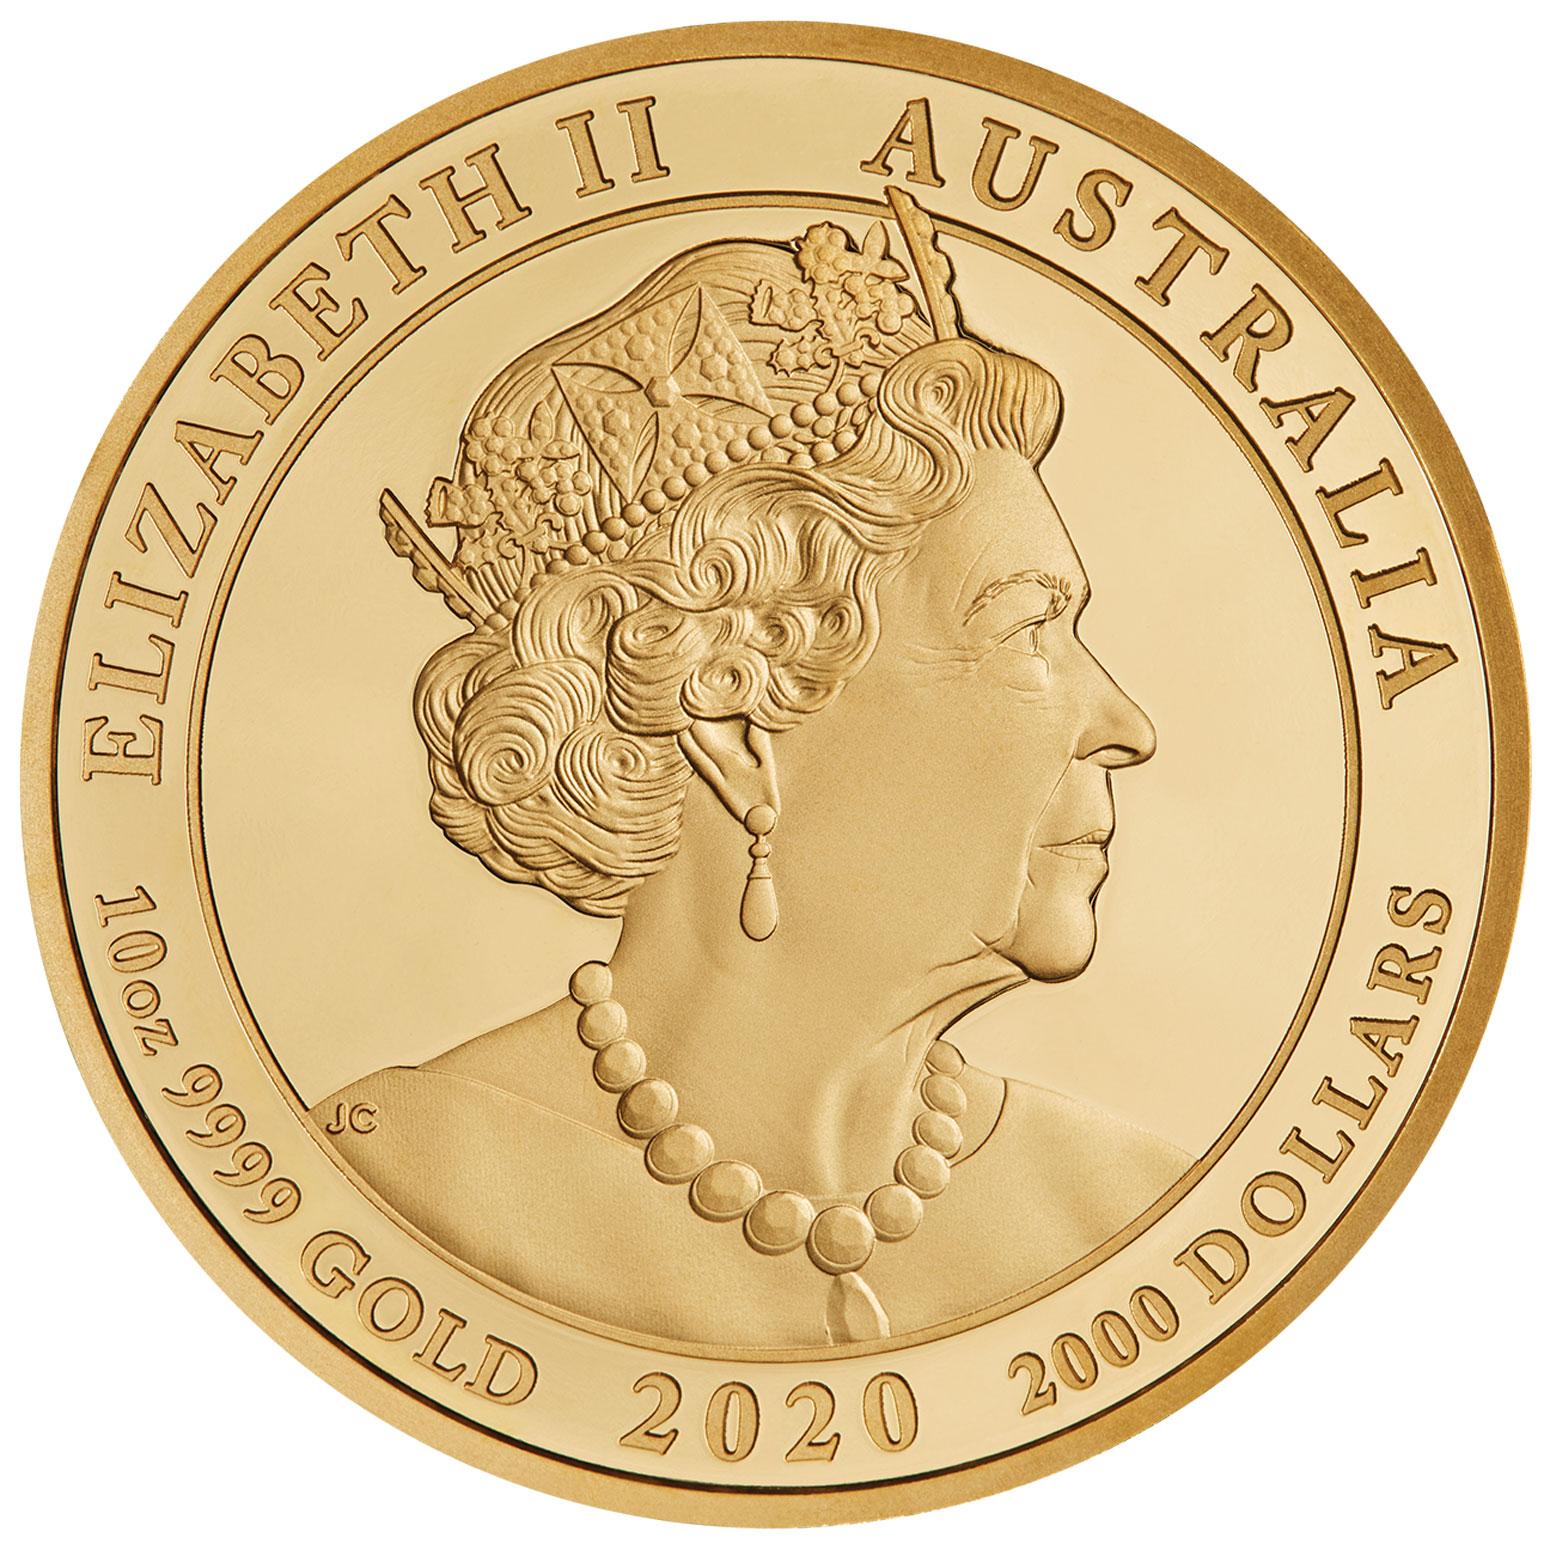 AU 2000 Dollars 2020 P